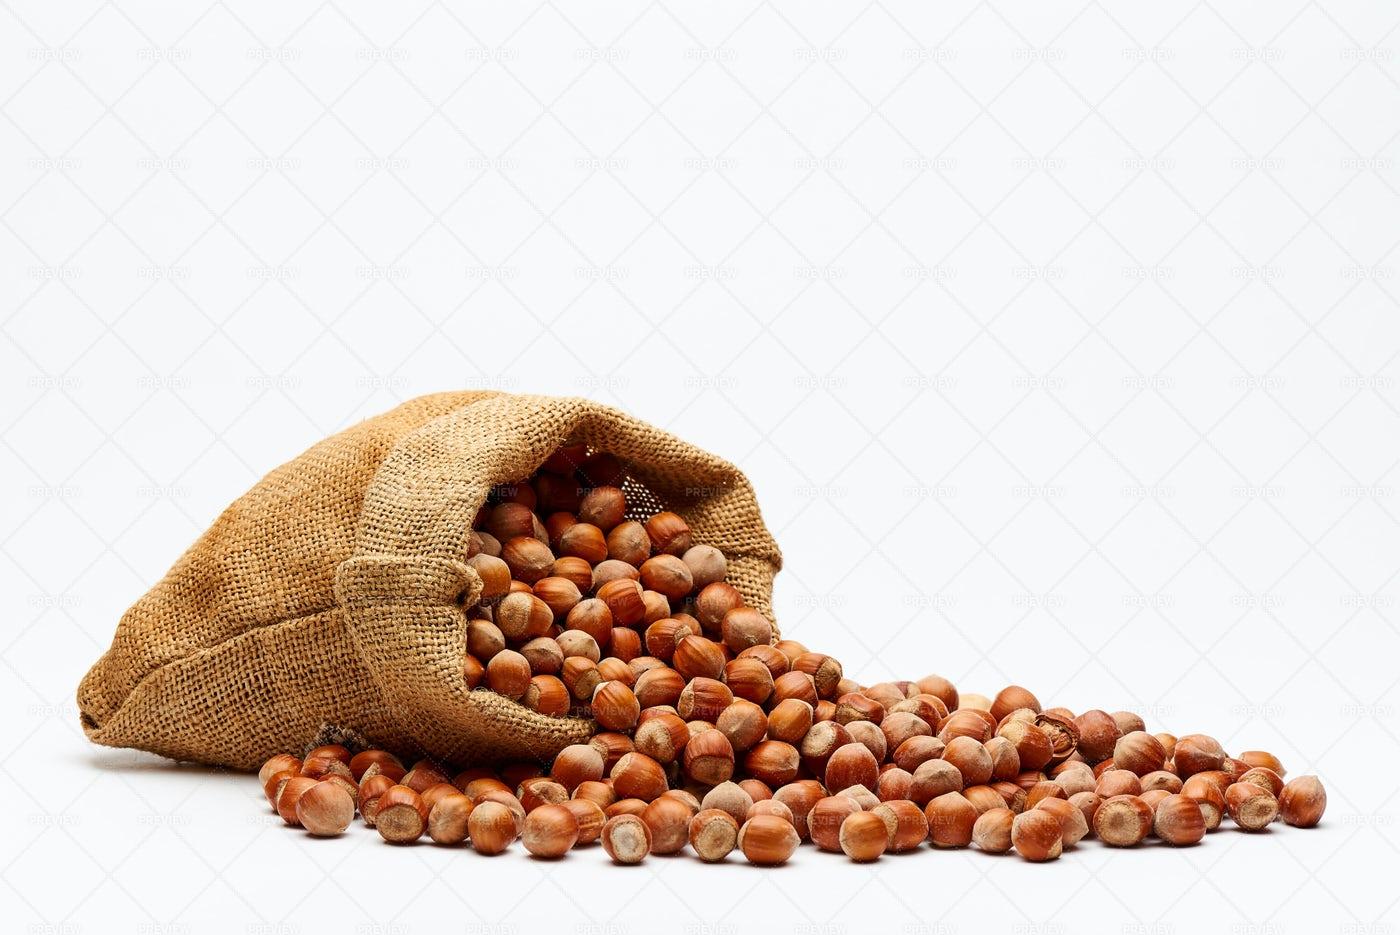 Bag With Hazelnuts.: Stock Photos